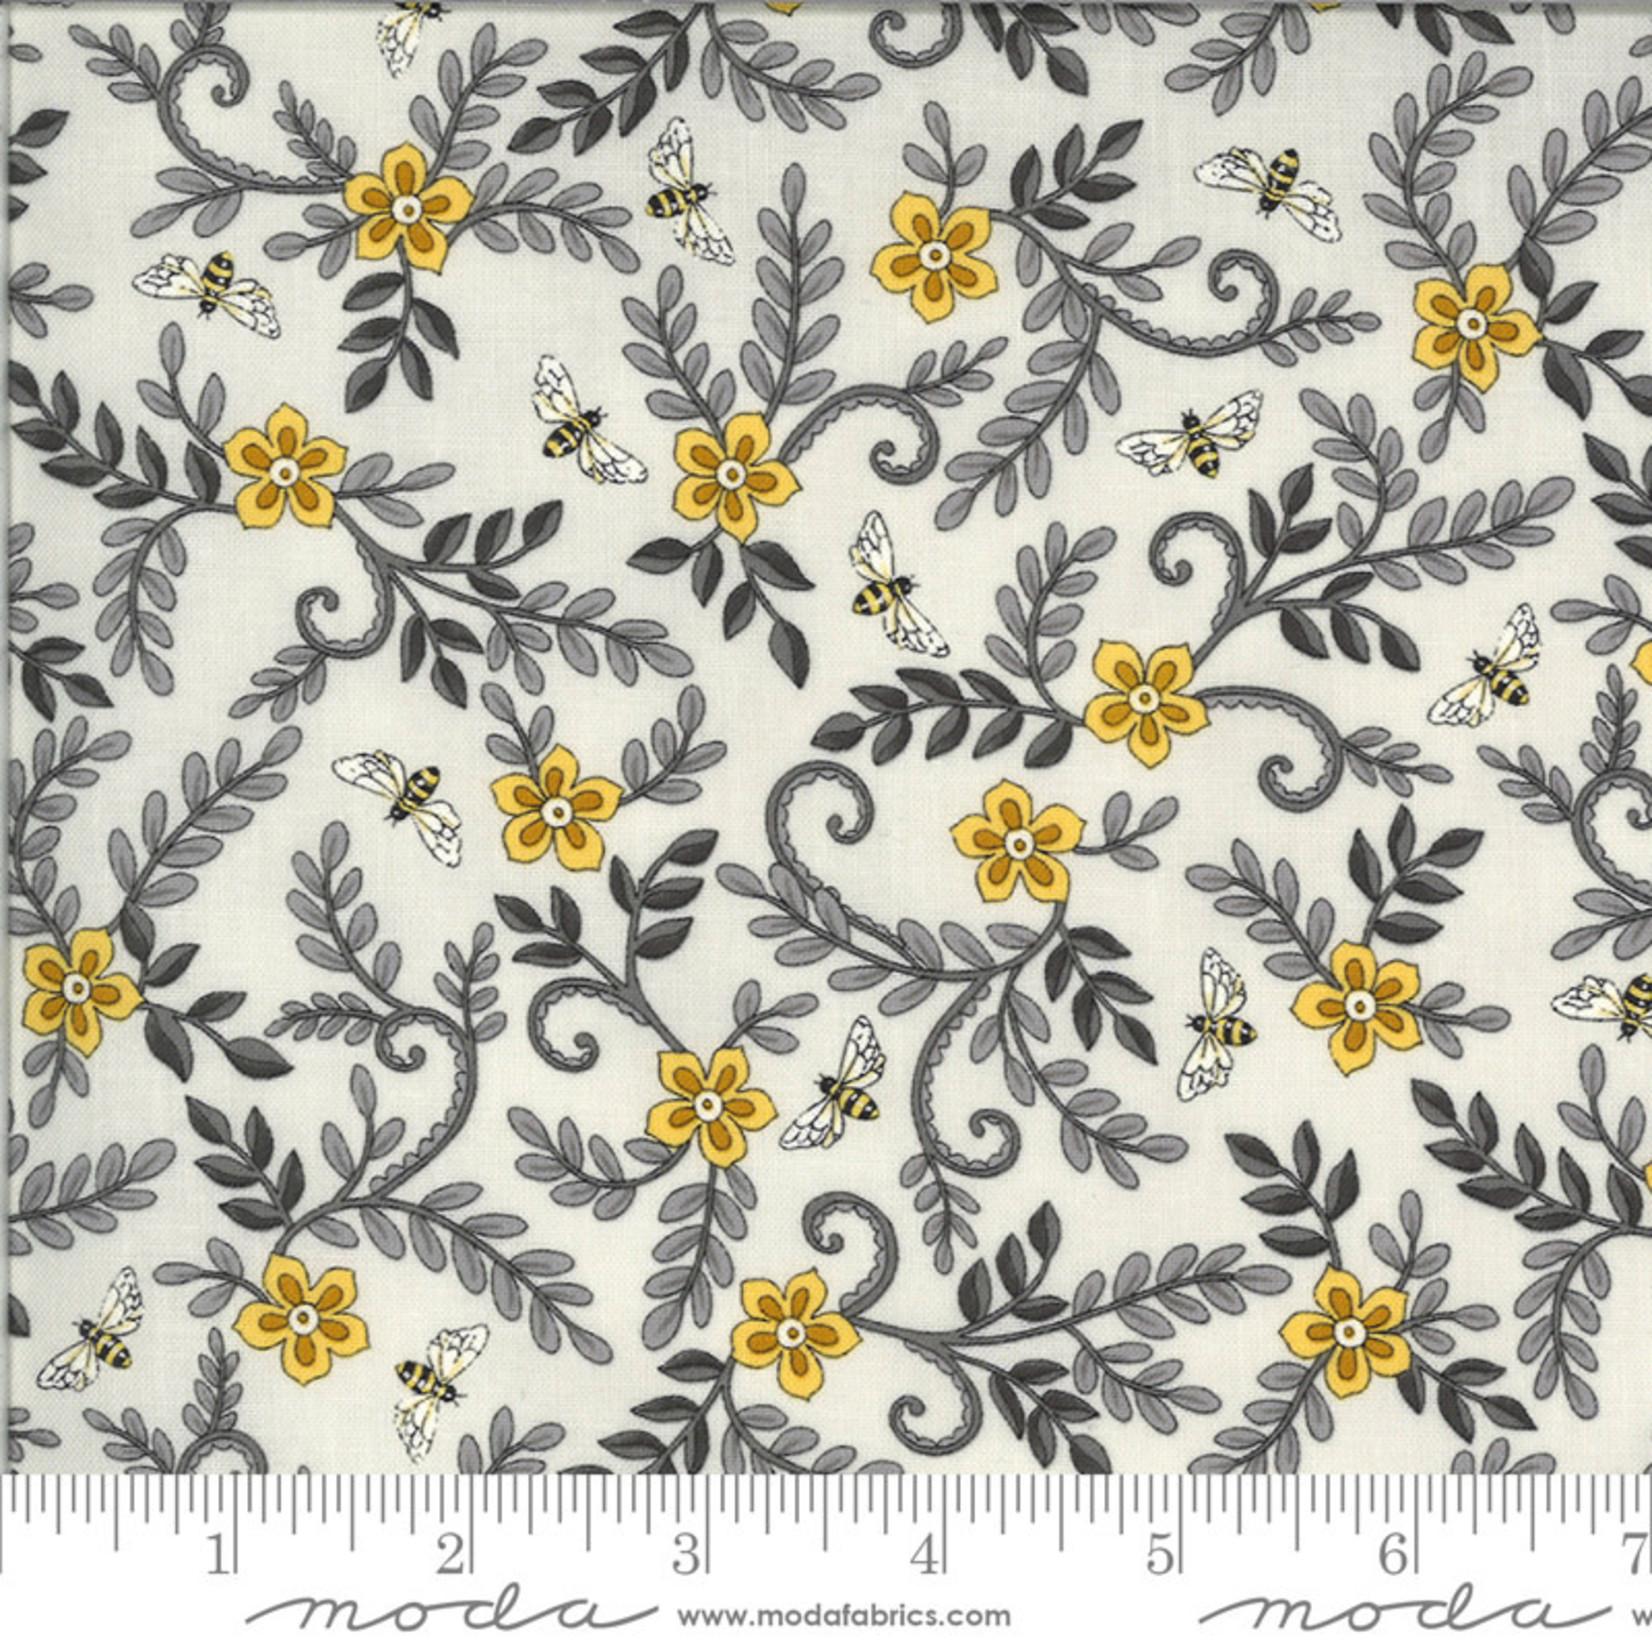 Deb Strain BEE GRATEFUL, FLOWER VINES AND BEES , DOVE GREY (19964 14) PER CM OR $21/M